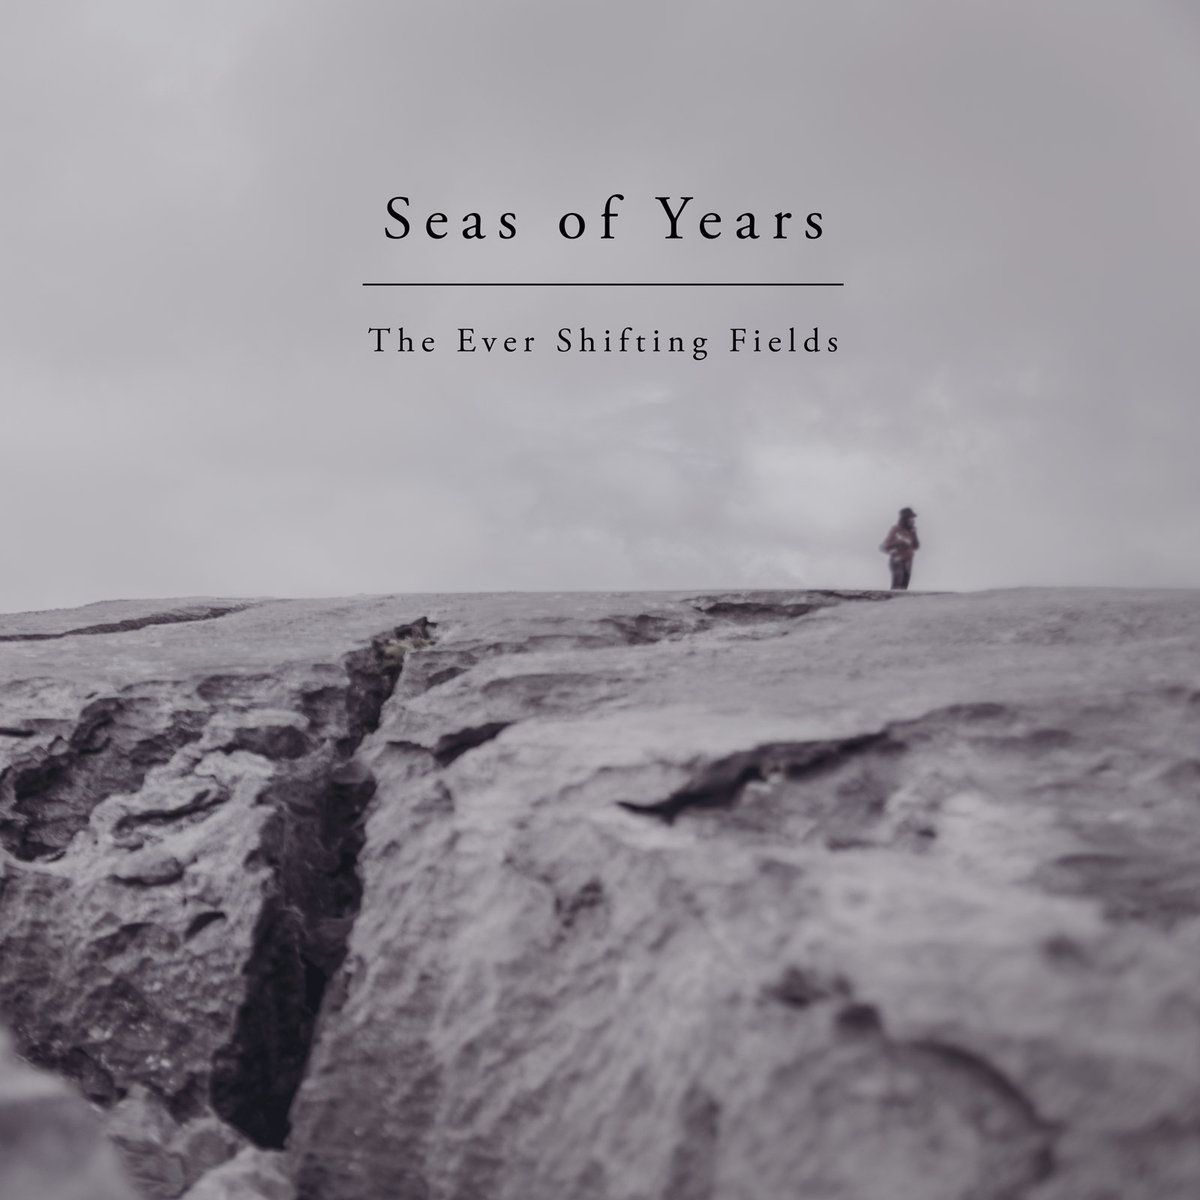 seas of years  u2013 the ever shifting fields  2016  seas of years  u2013 the ever shifting fields  2016    2016 album      rh   pinterest